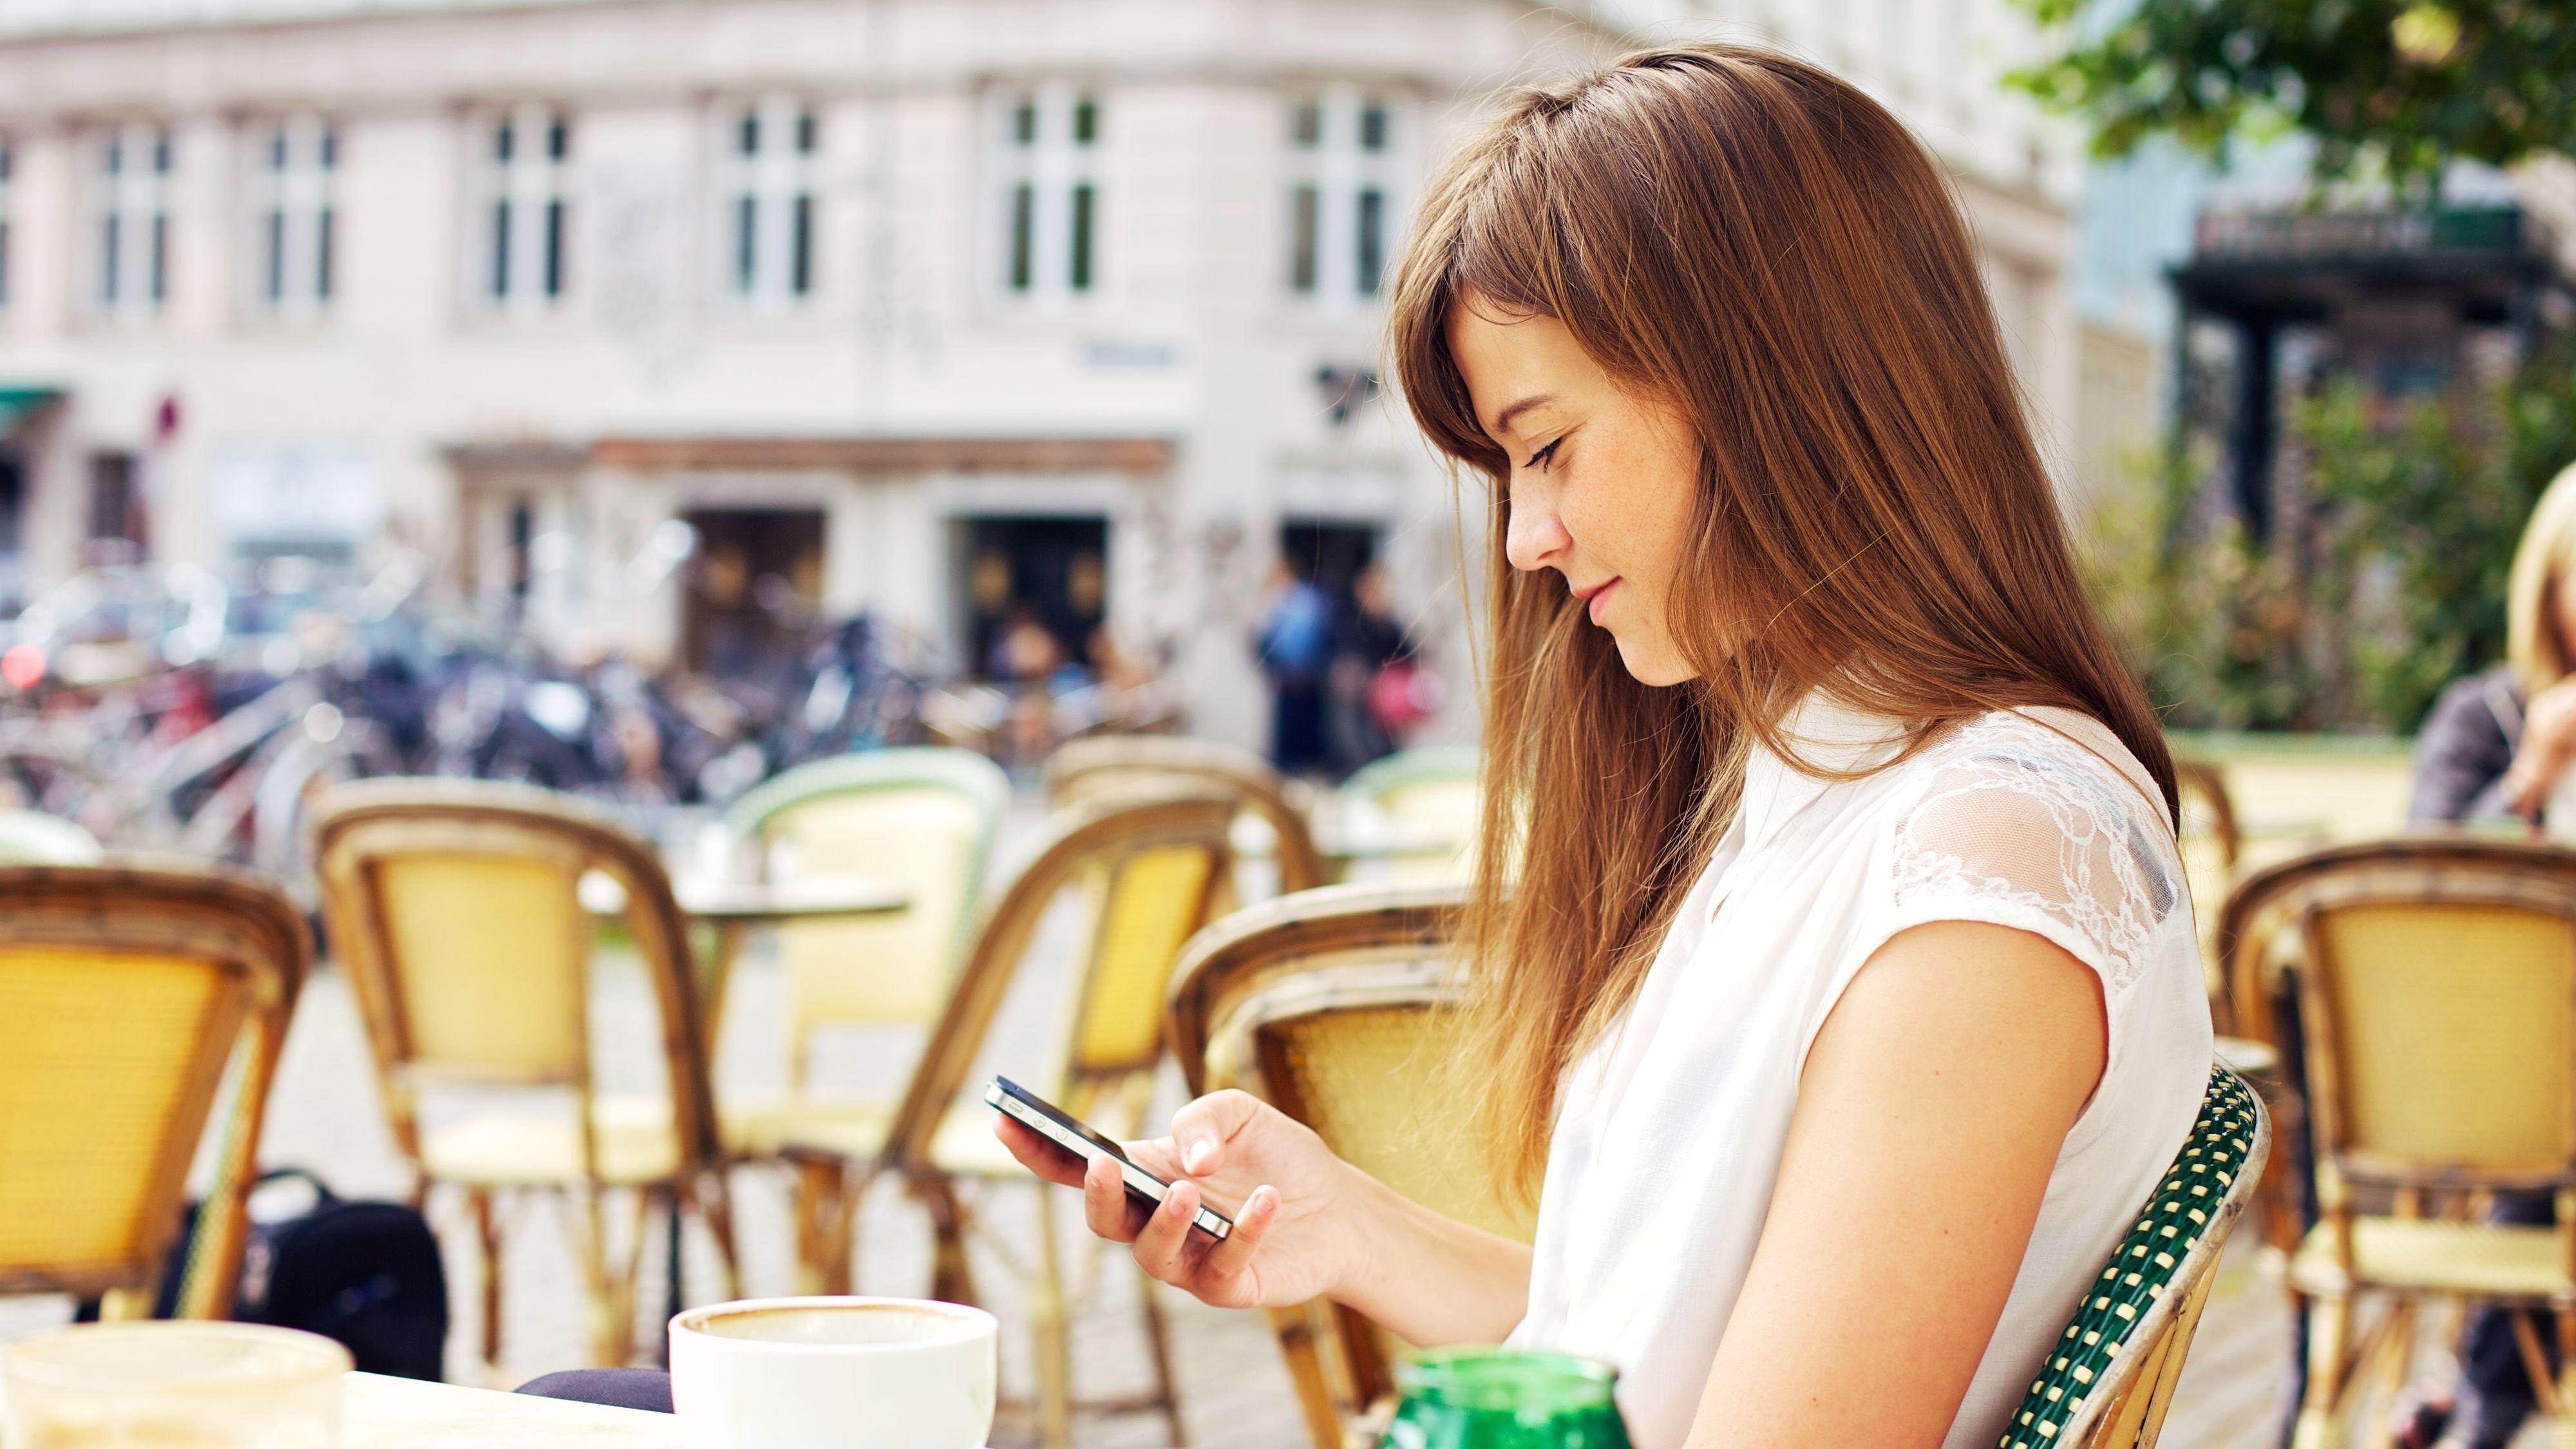 Restauranter skal få fart på mobil betaling